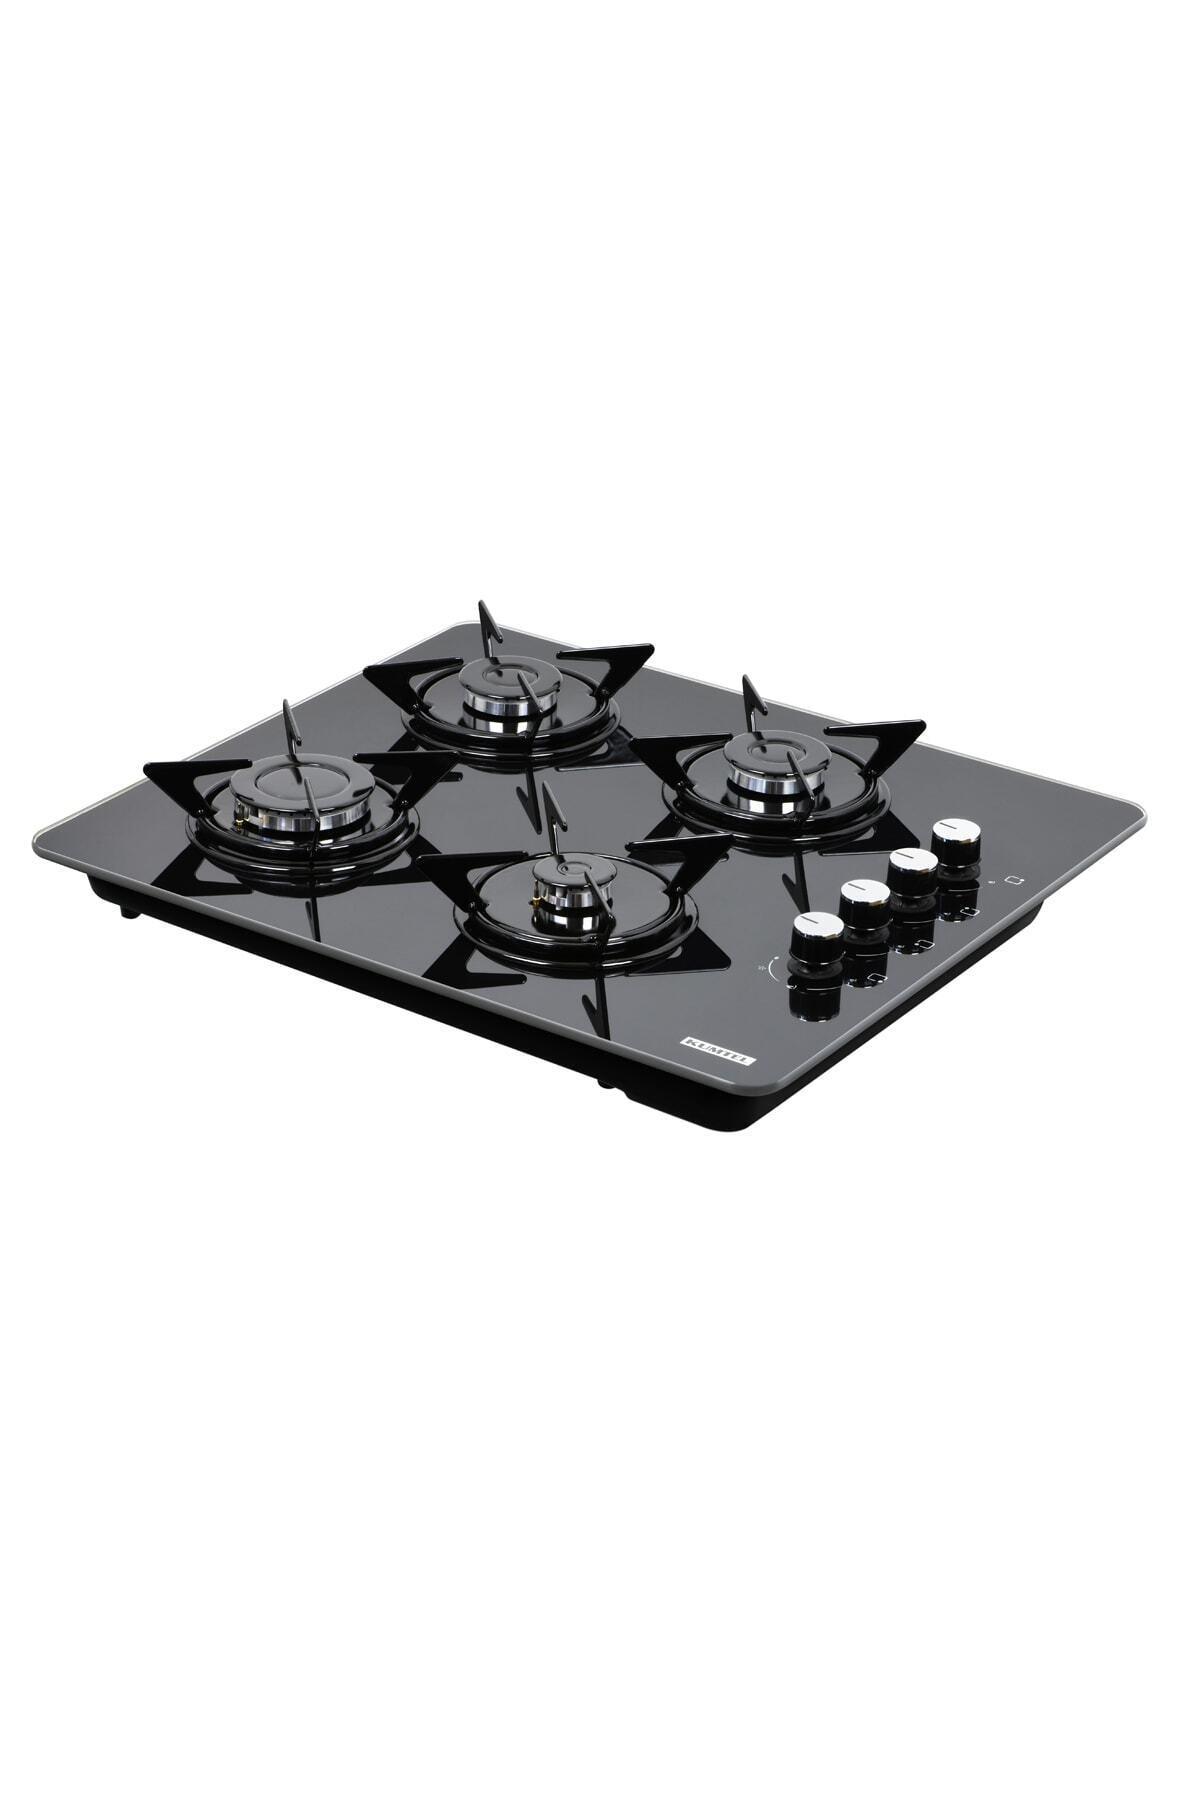 KUMTEL Ko-40 Tshdf Siyah Oval Set Üstü Cam Ocak ( 8mm )